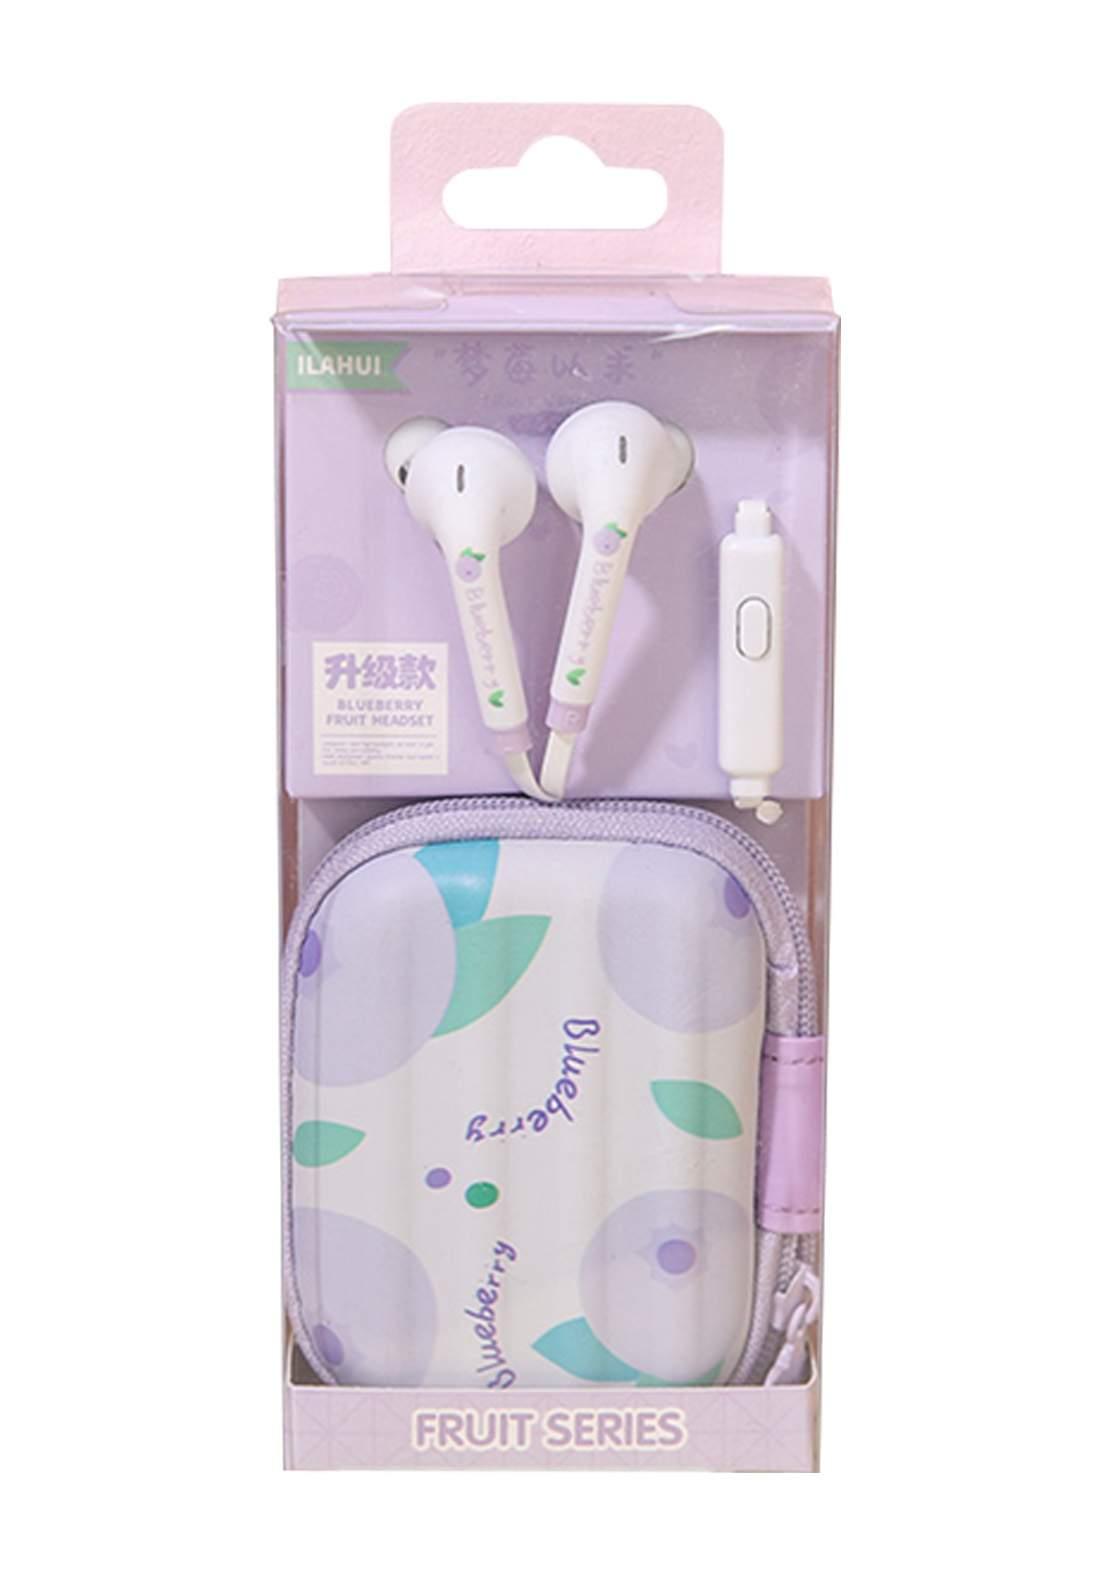 Ilahui Wired Headphones With Leather Case سماعة مع حافظة